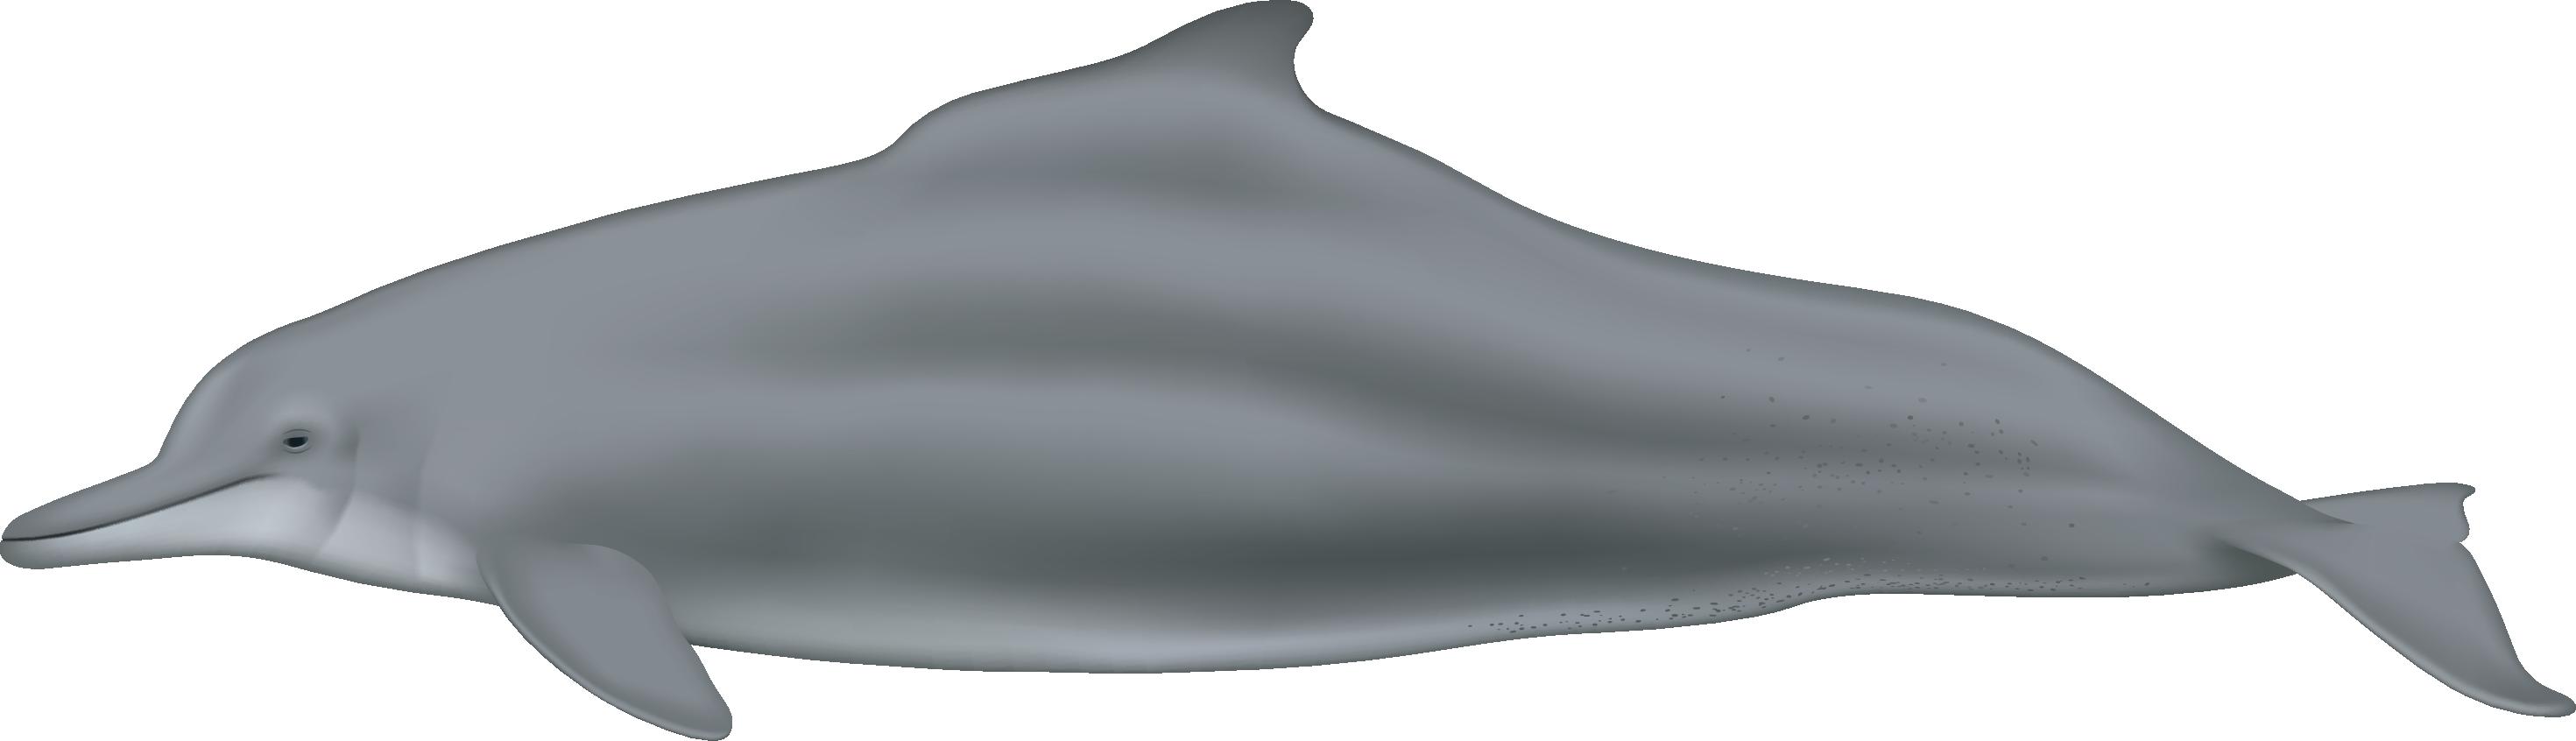 Sousa teuszii - Society for Marine Mammalogy